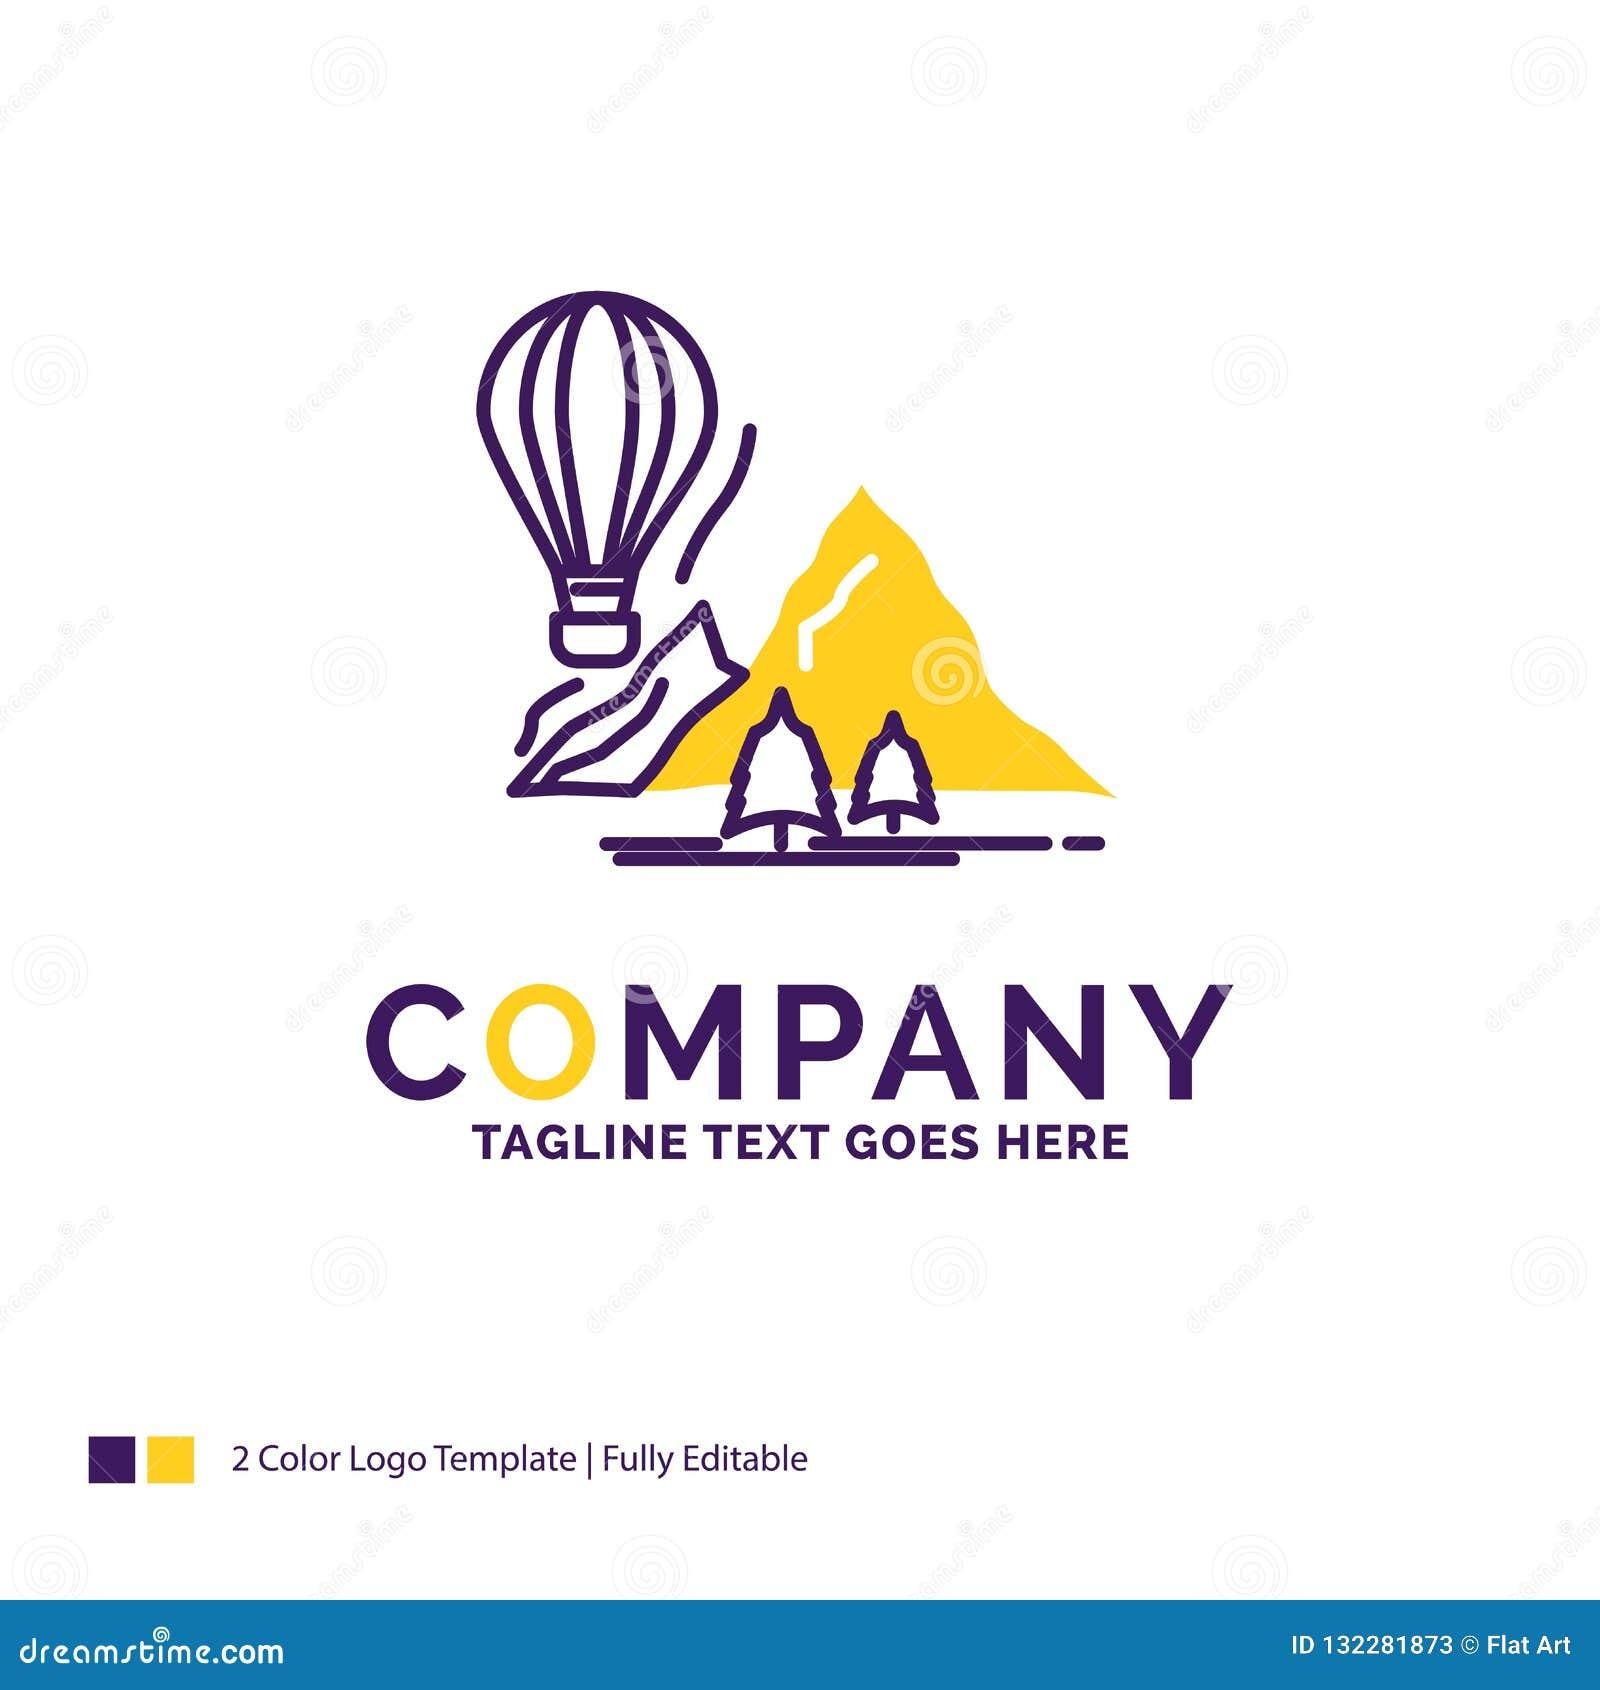 Company Name Logo Design For explore, travel, mountains, camping